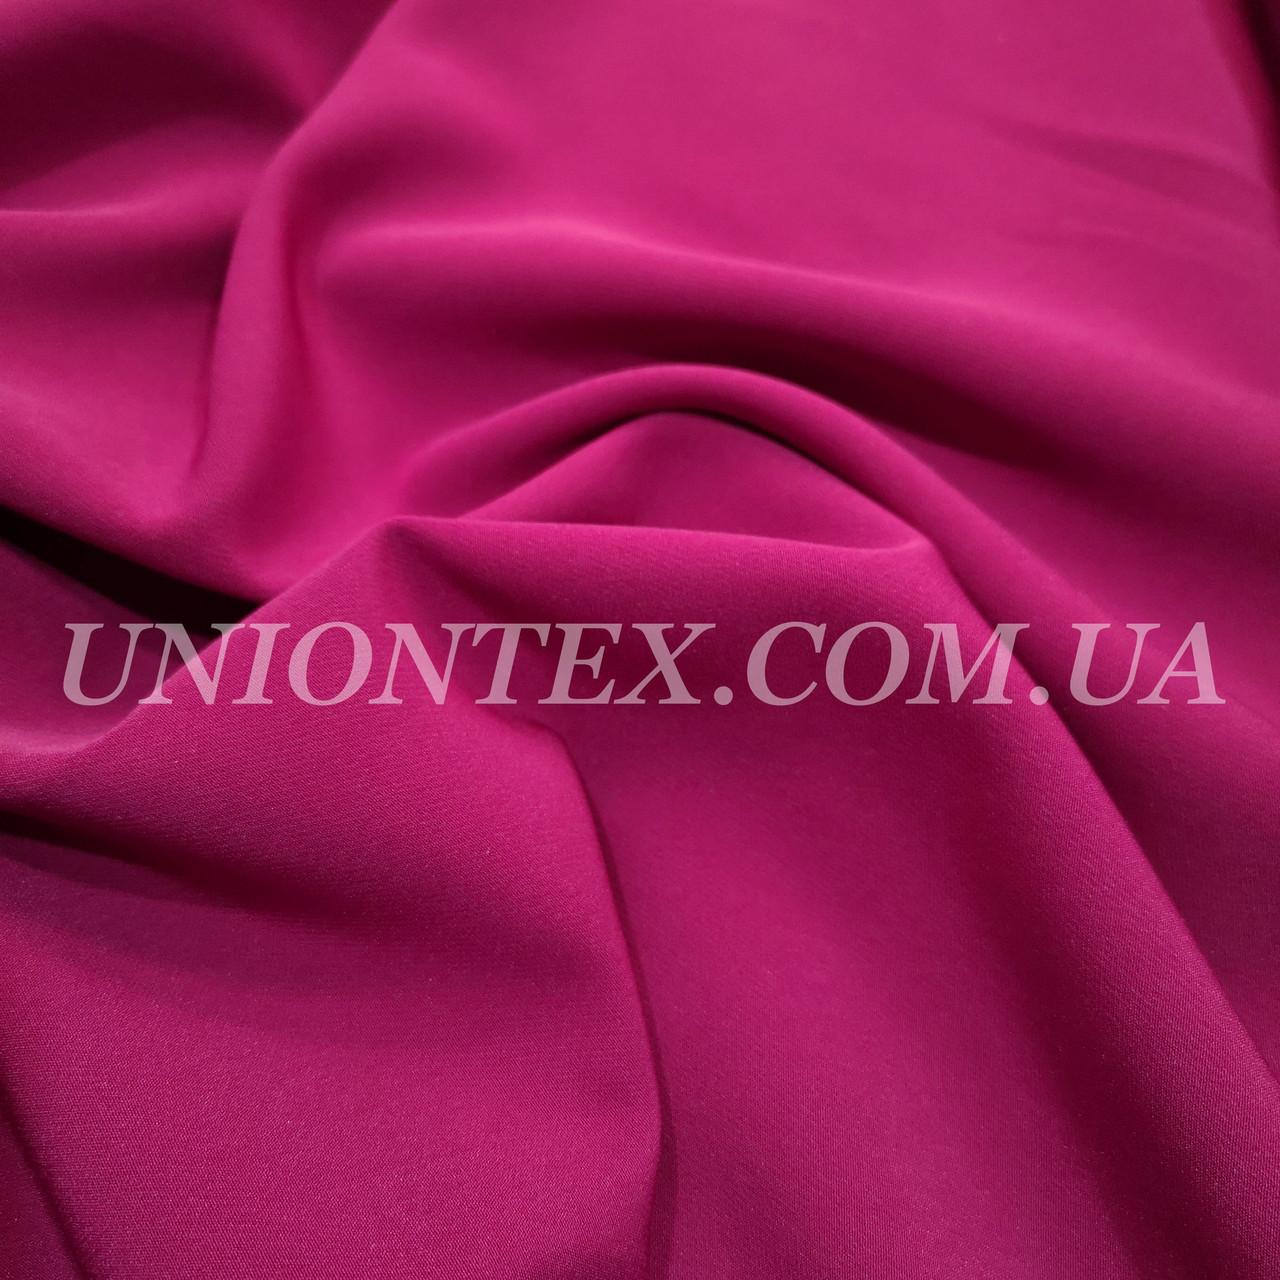 4aab0427970 Ткань креп костюмка Барби фуксия - Магазин тканей и фурнитуры Юнионтекс-  опт и розница Украина